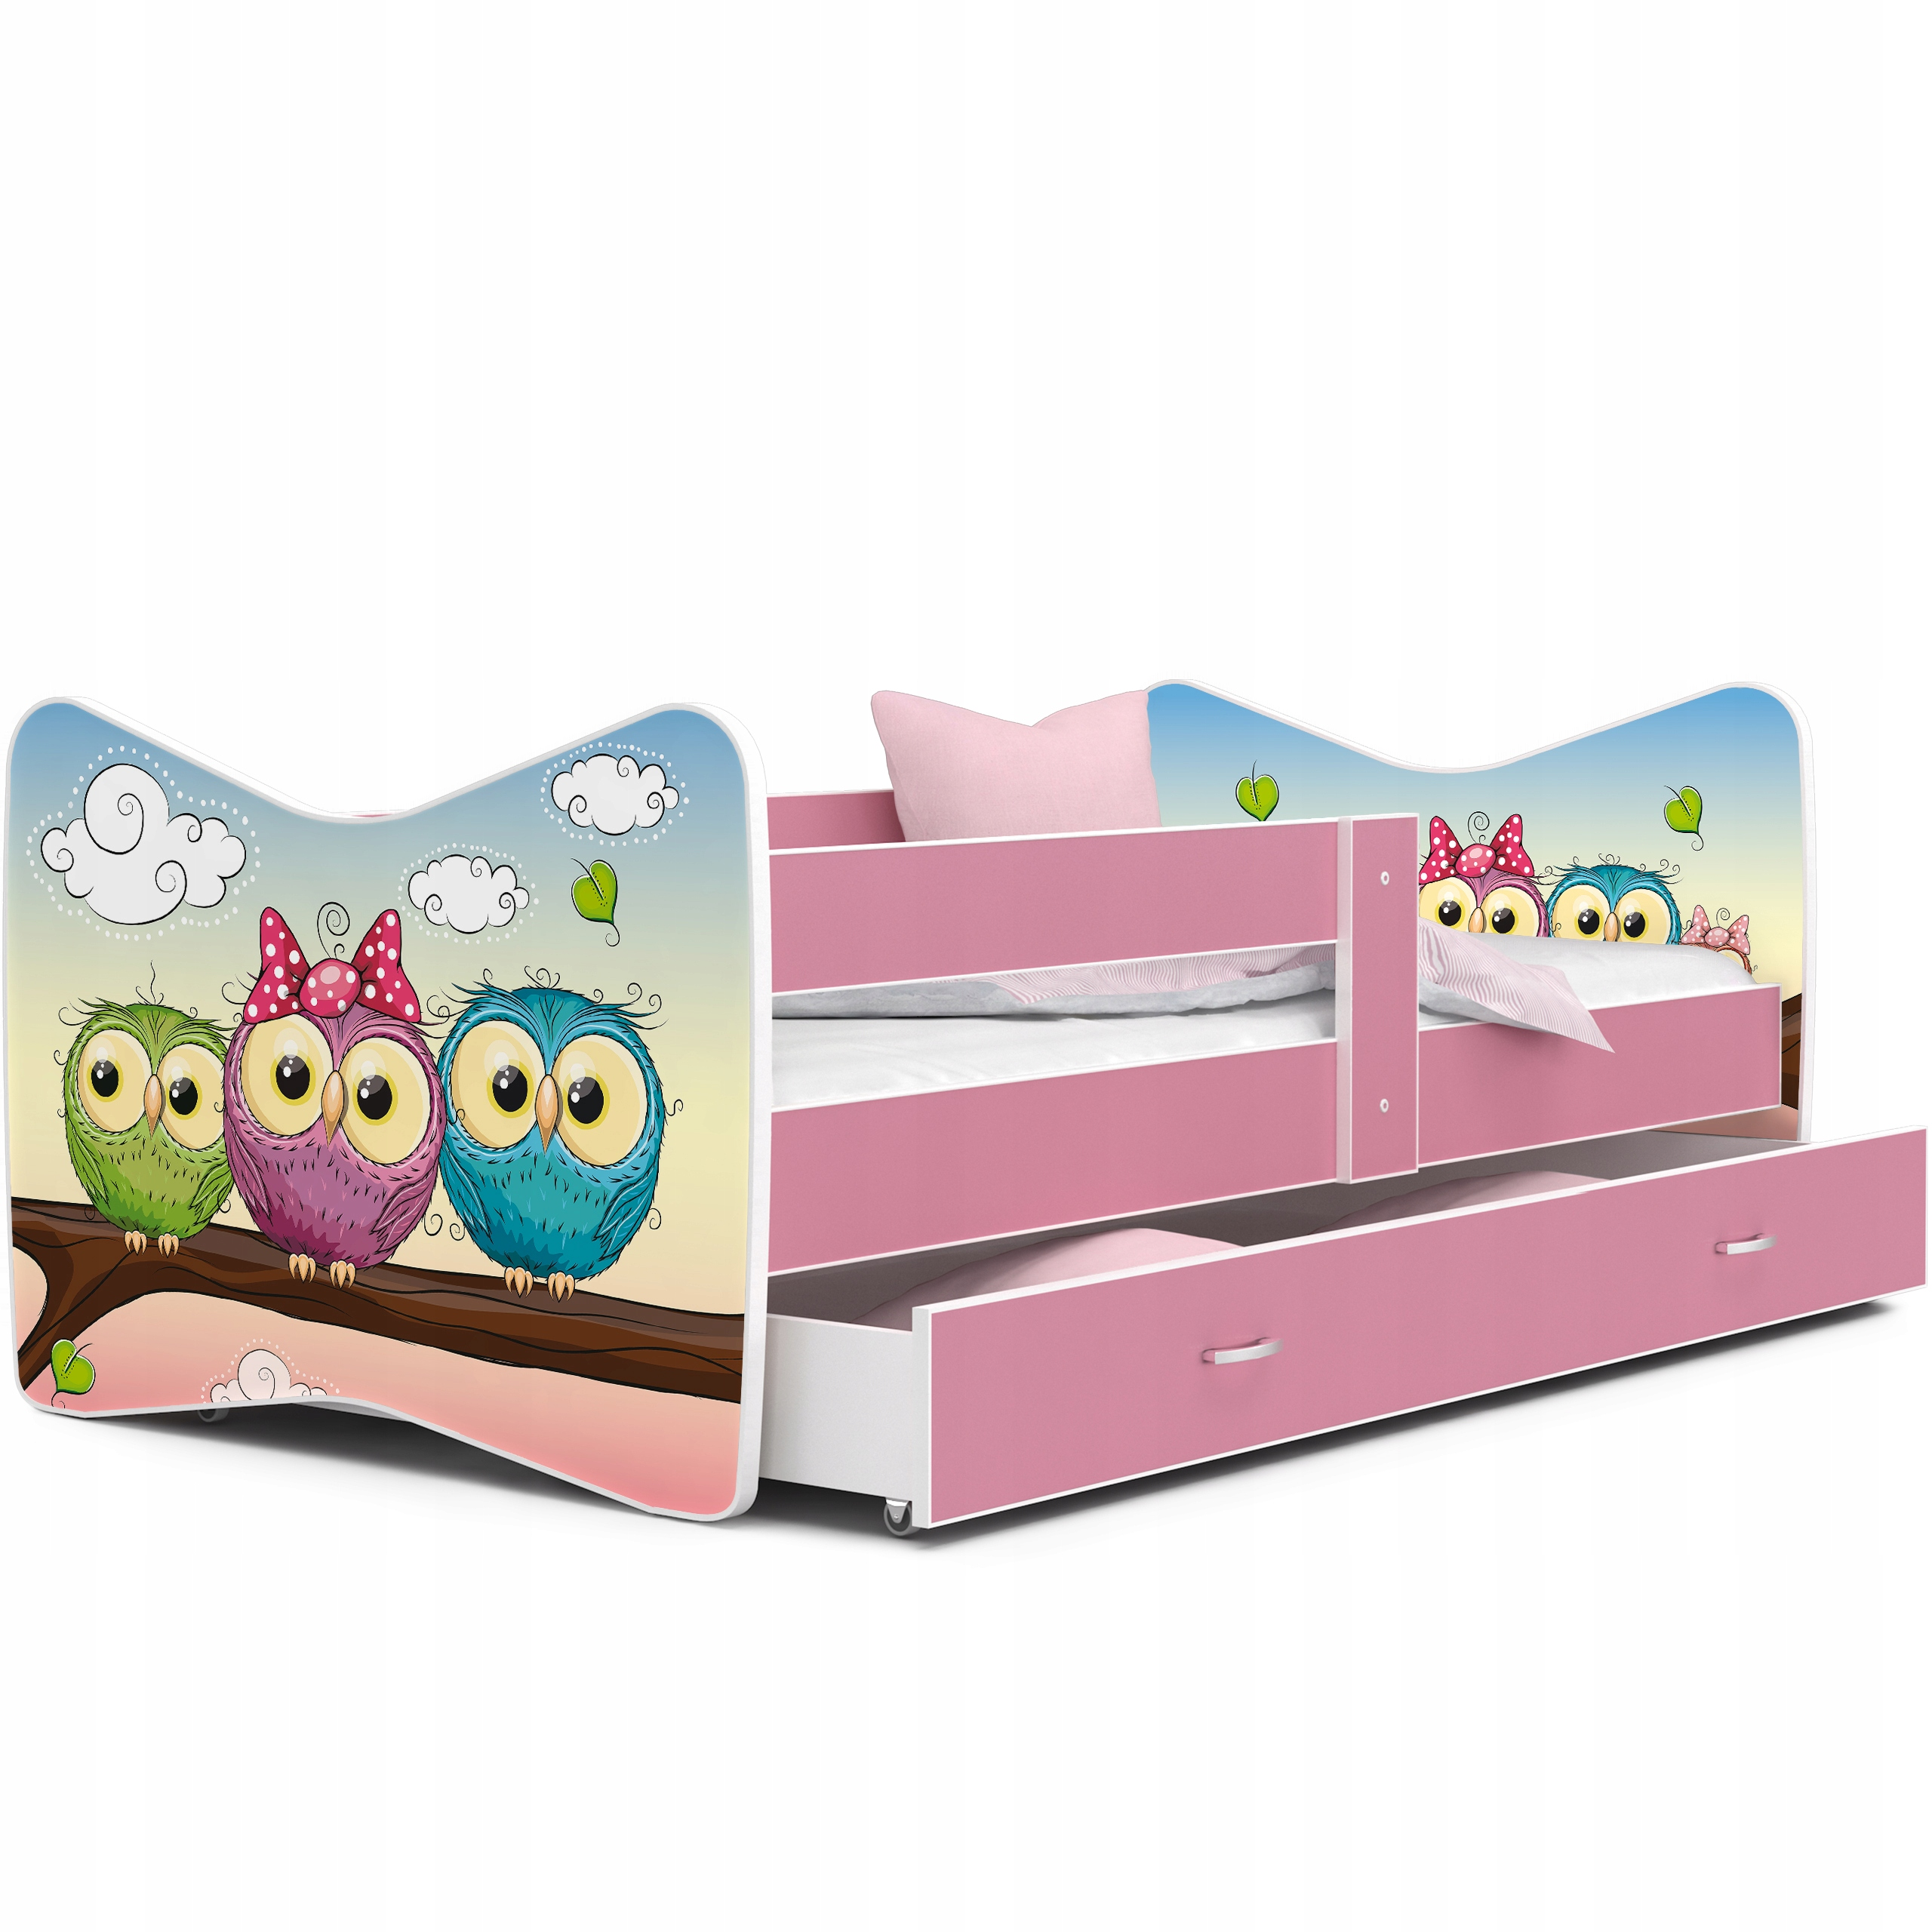 łóżko TOMI COLOR 140x70 szuflada materac barierka